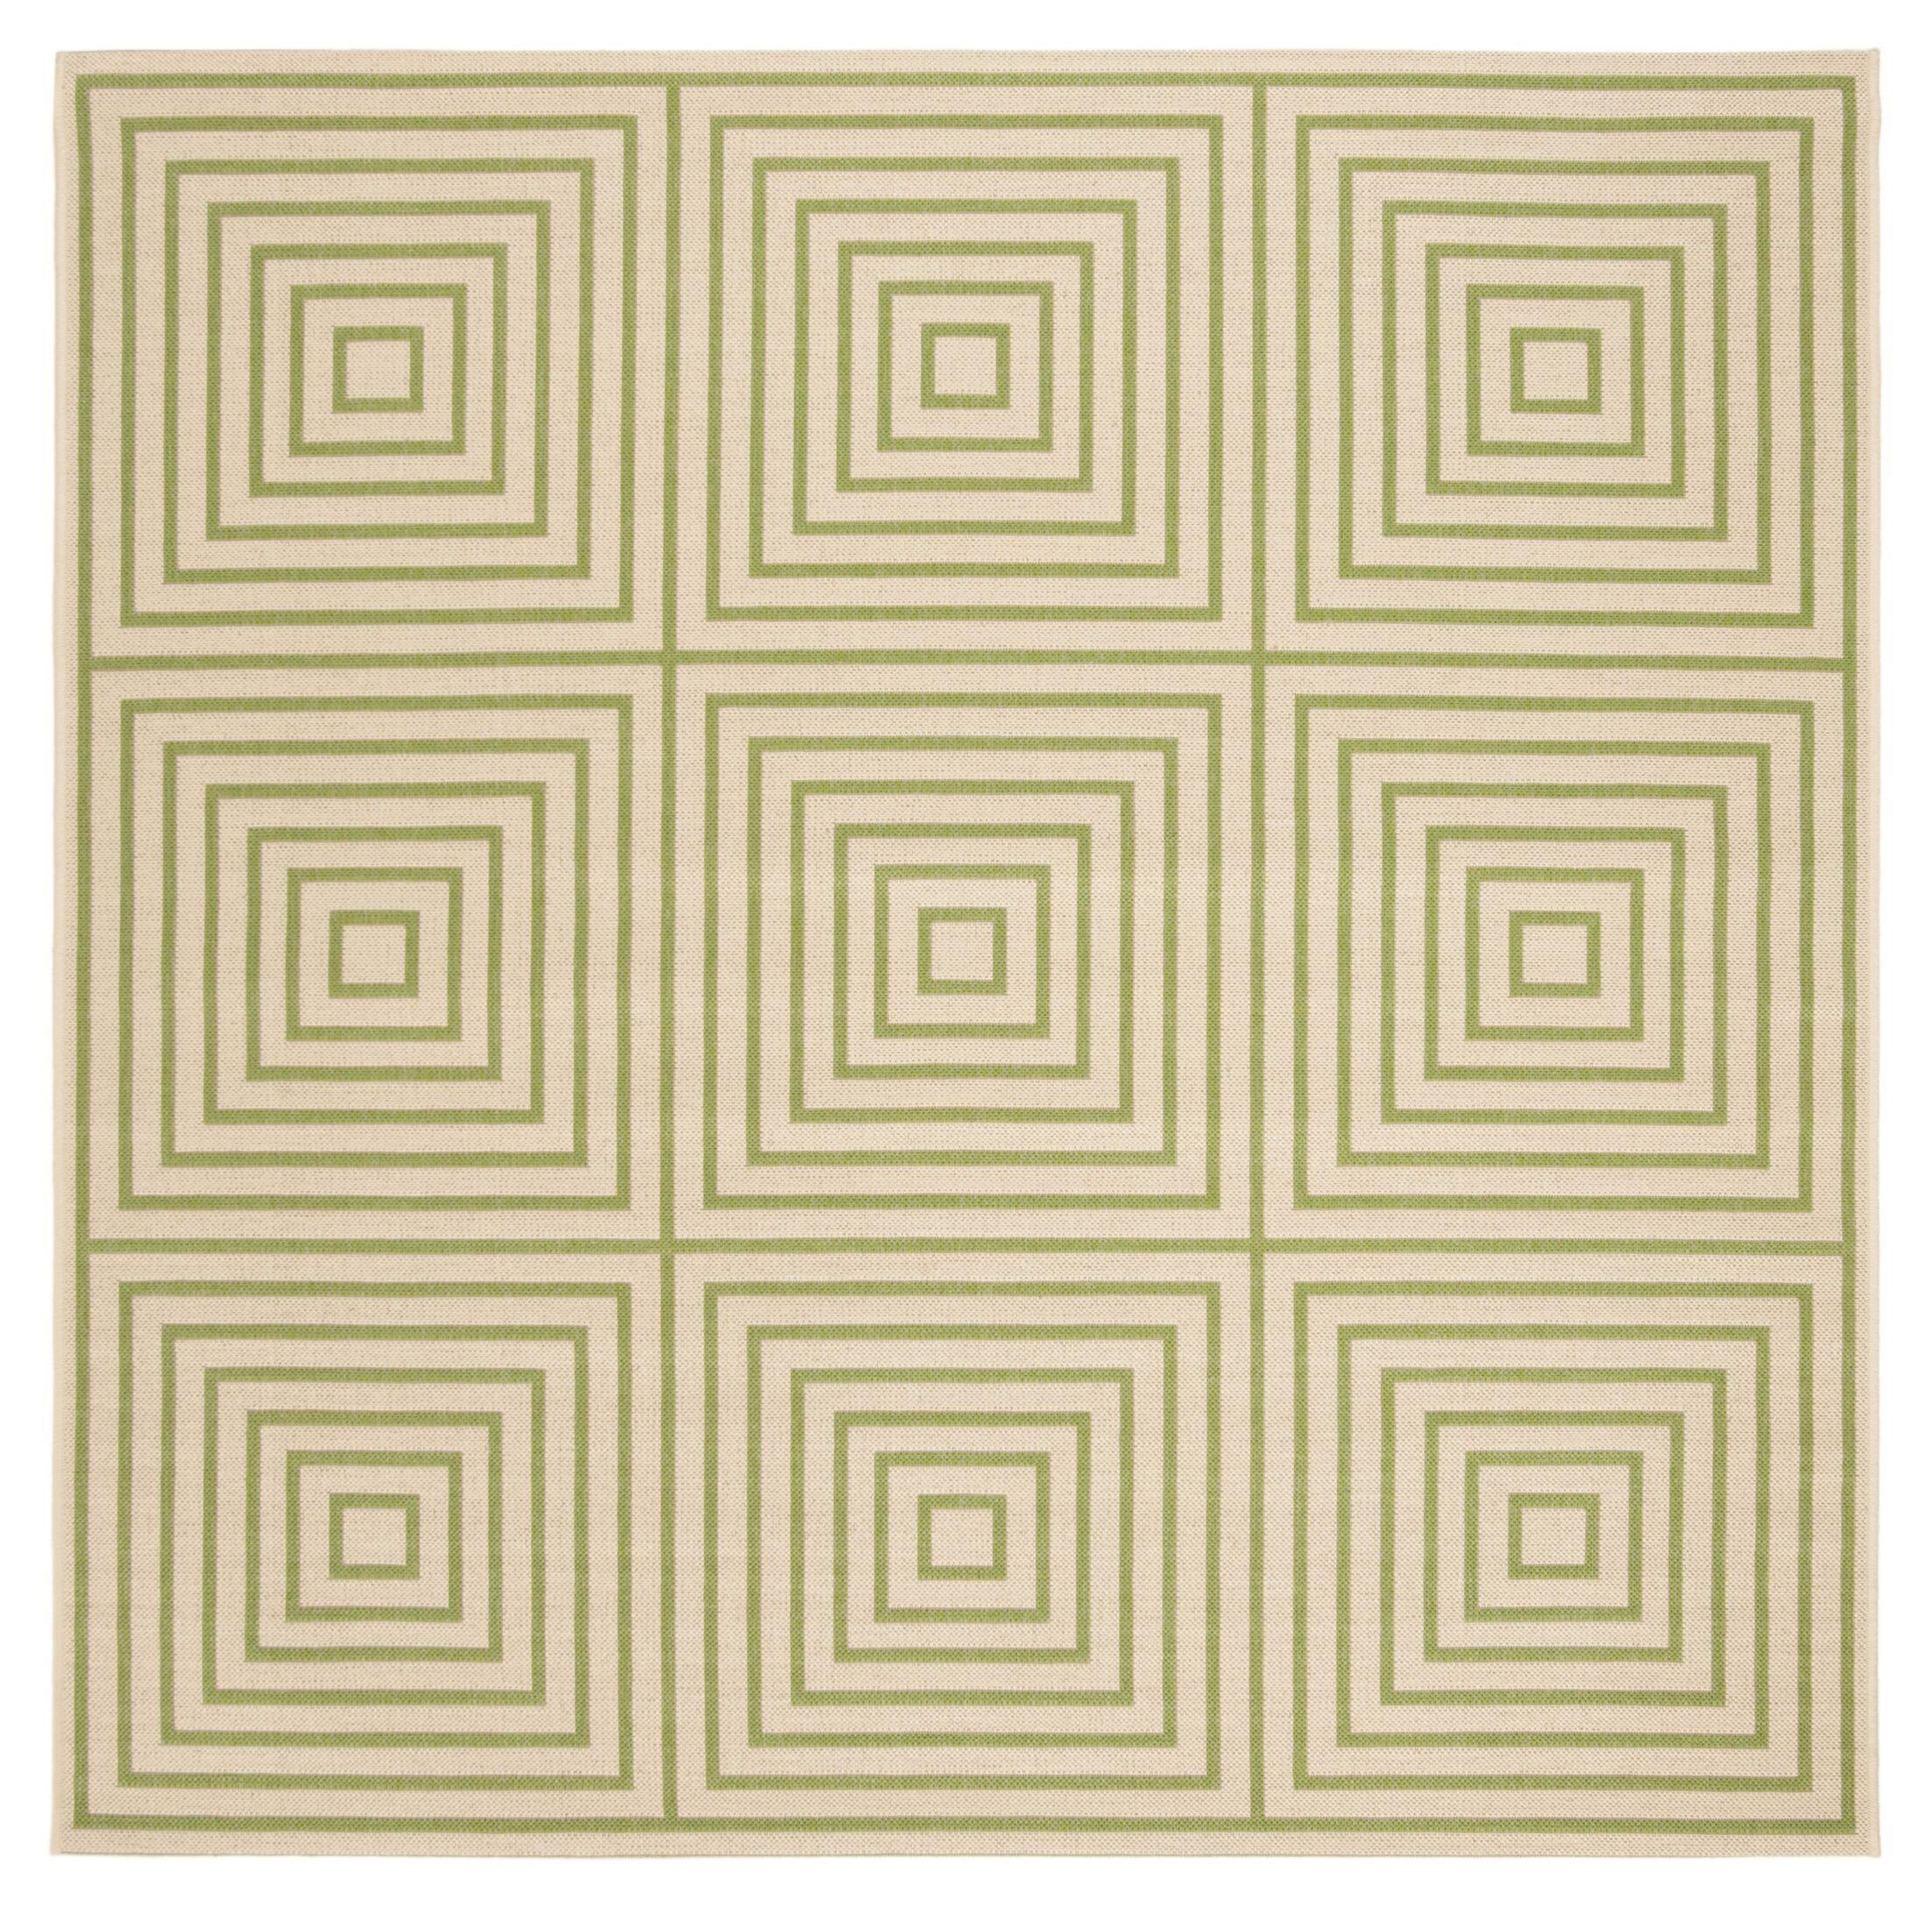 Horne Cream/Olive Area Rug Rug Size: Square 6'7